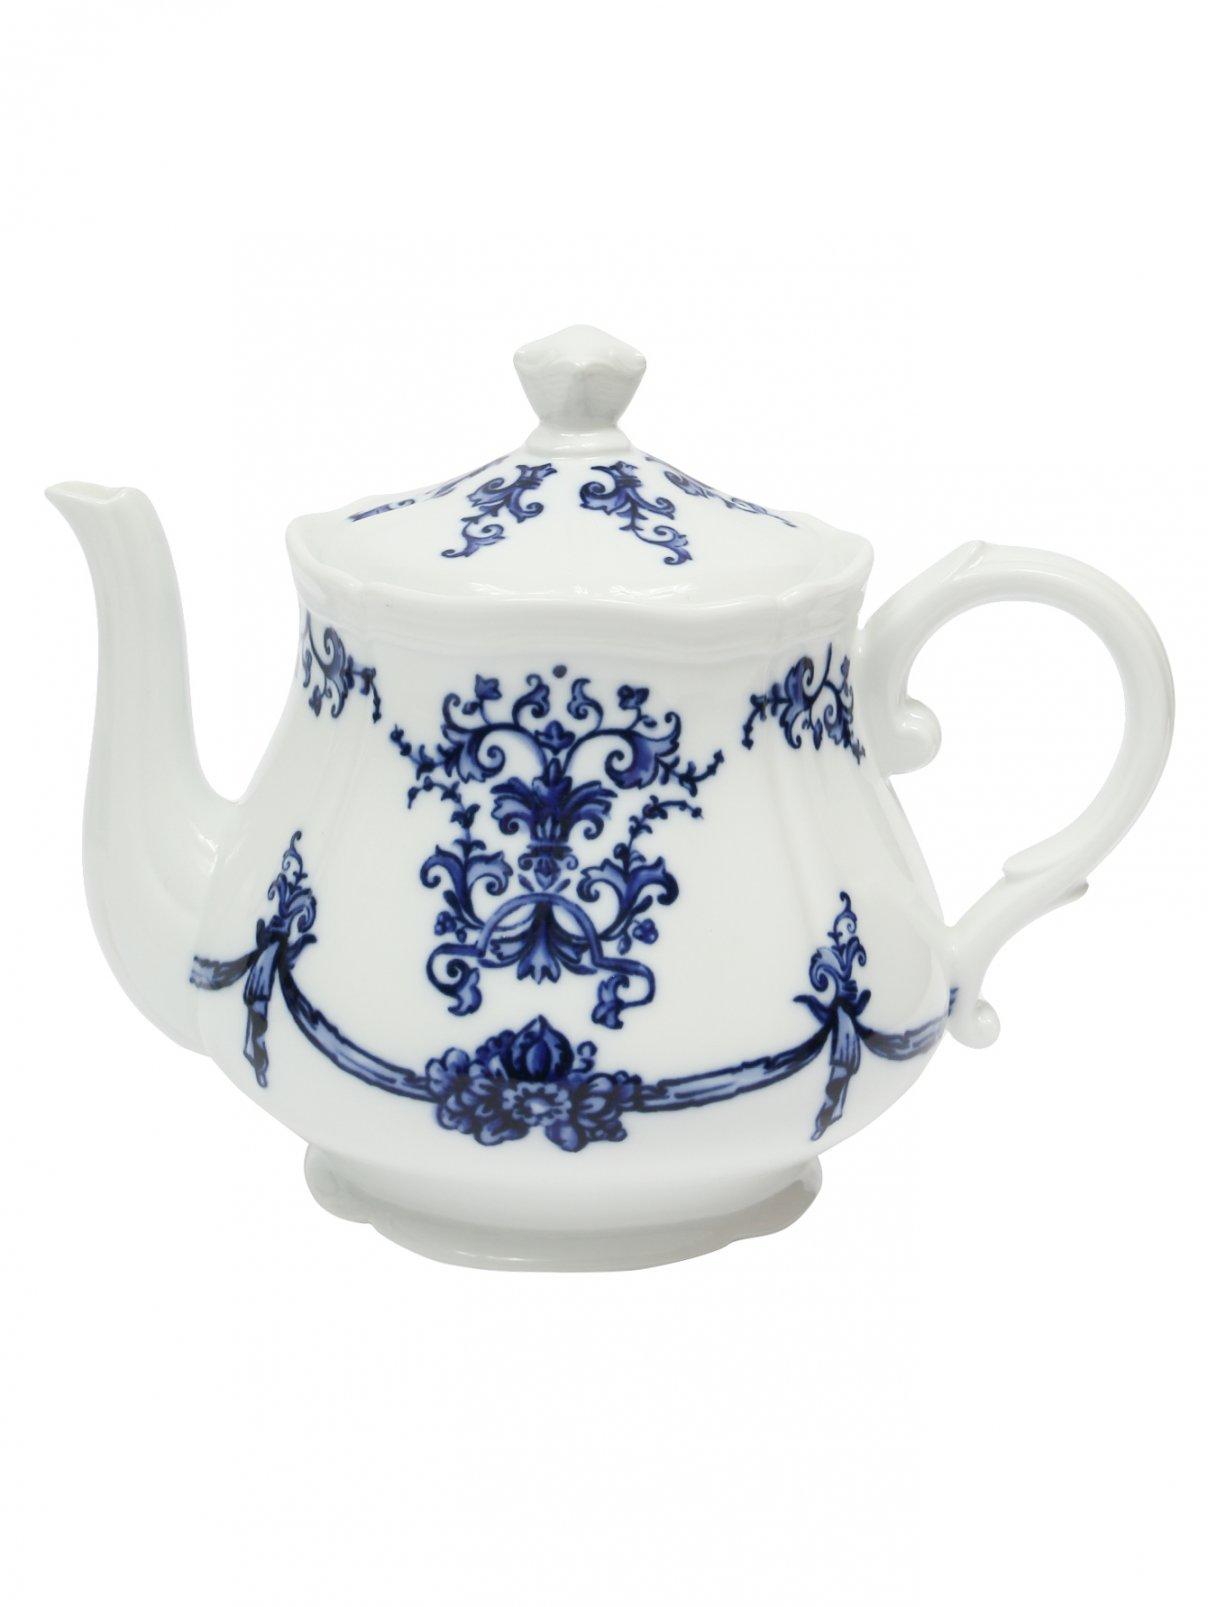 Чайник из фарфора с орнаментом Richard Ginori 1735  –  Общий вид